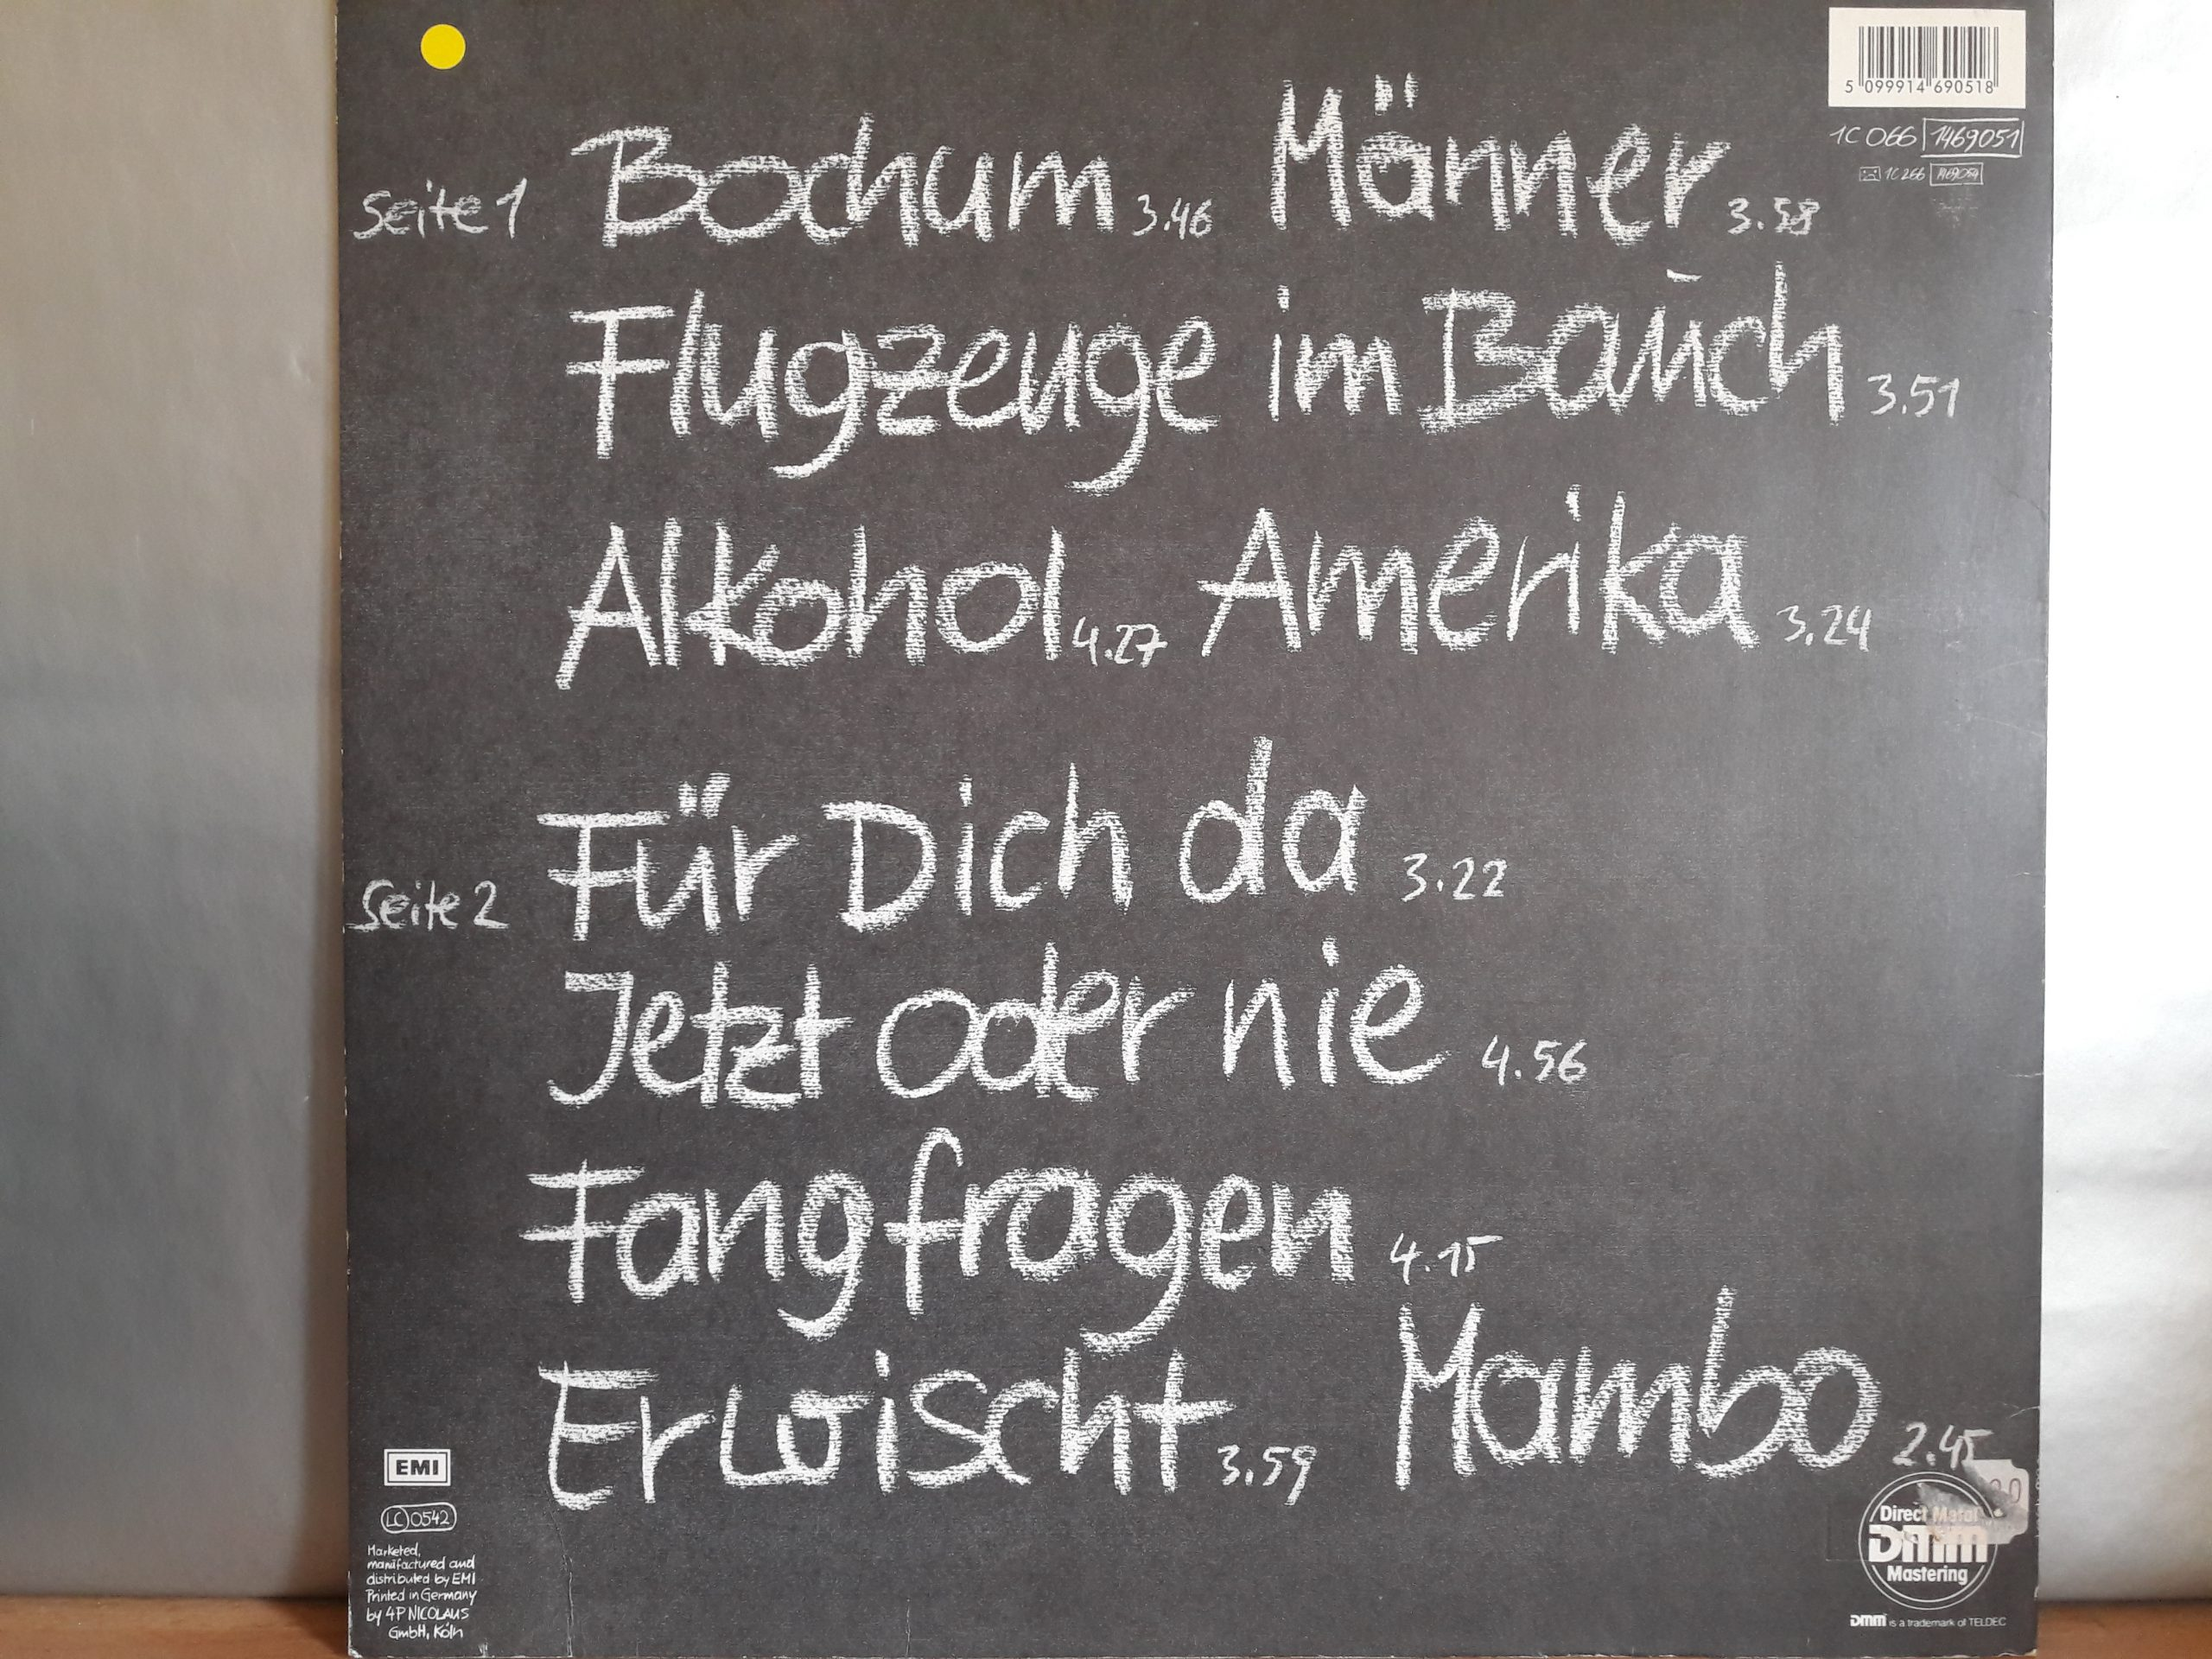 Bochum single grönemeyer